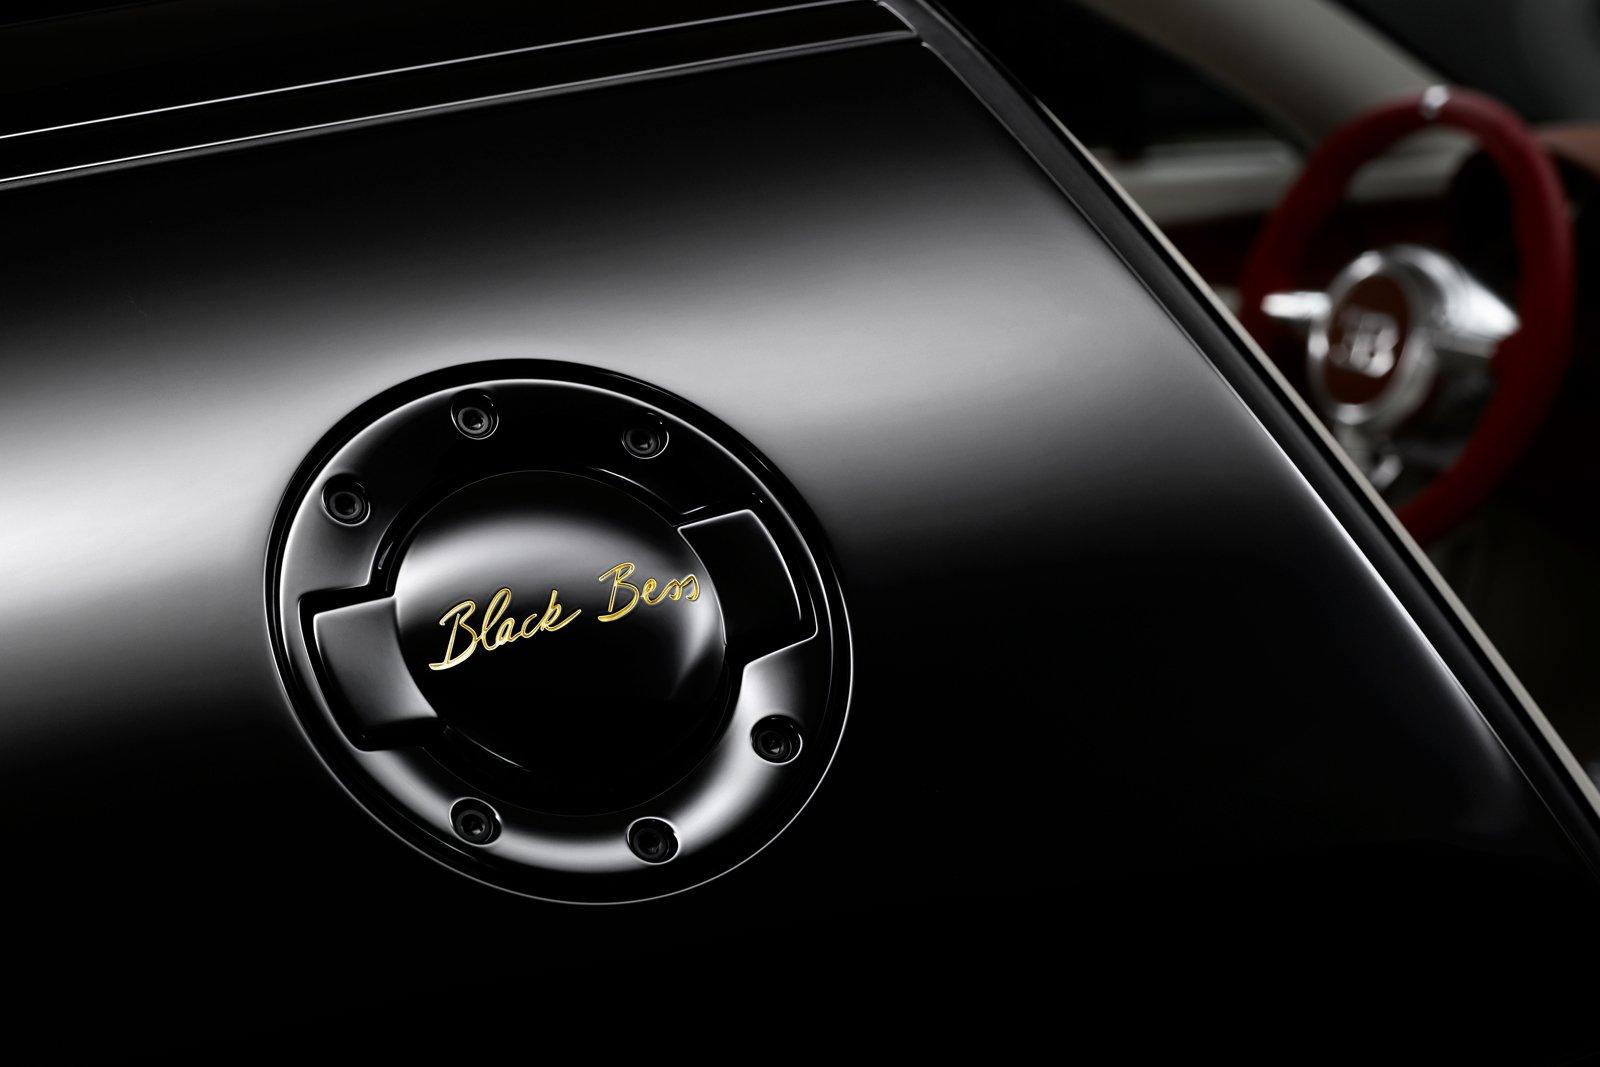 bugatti veyron 16 4 grand sport vitesse black bess. Black Bedroom Furniture Sets. Home Design Ideas